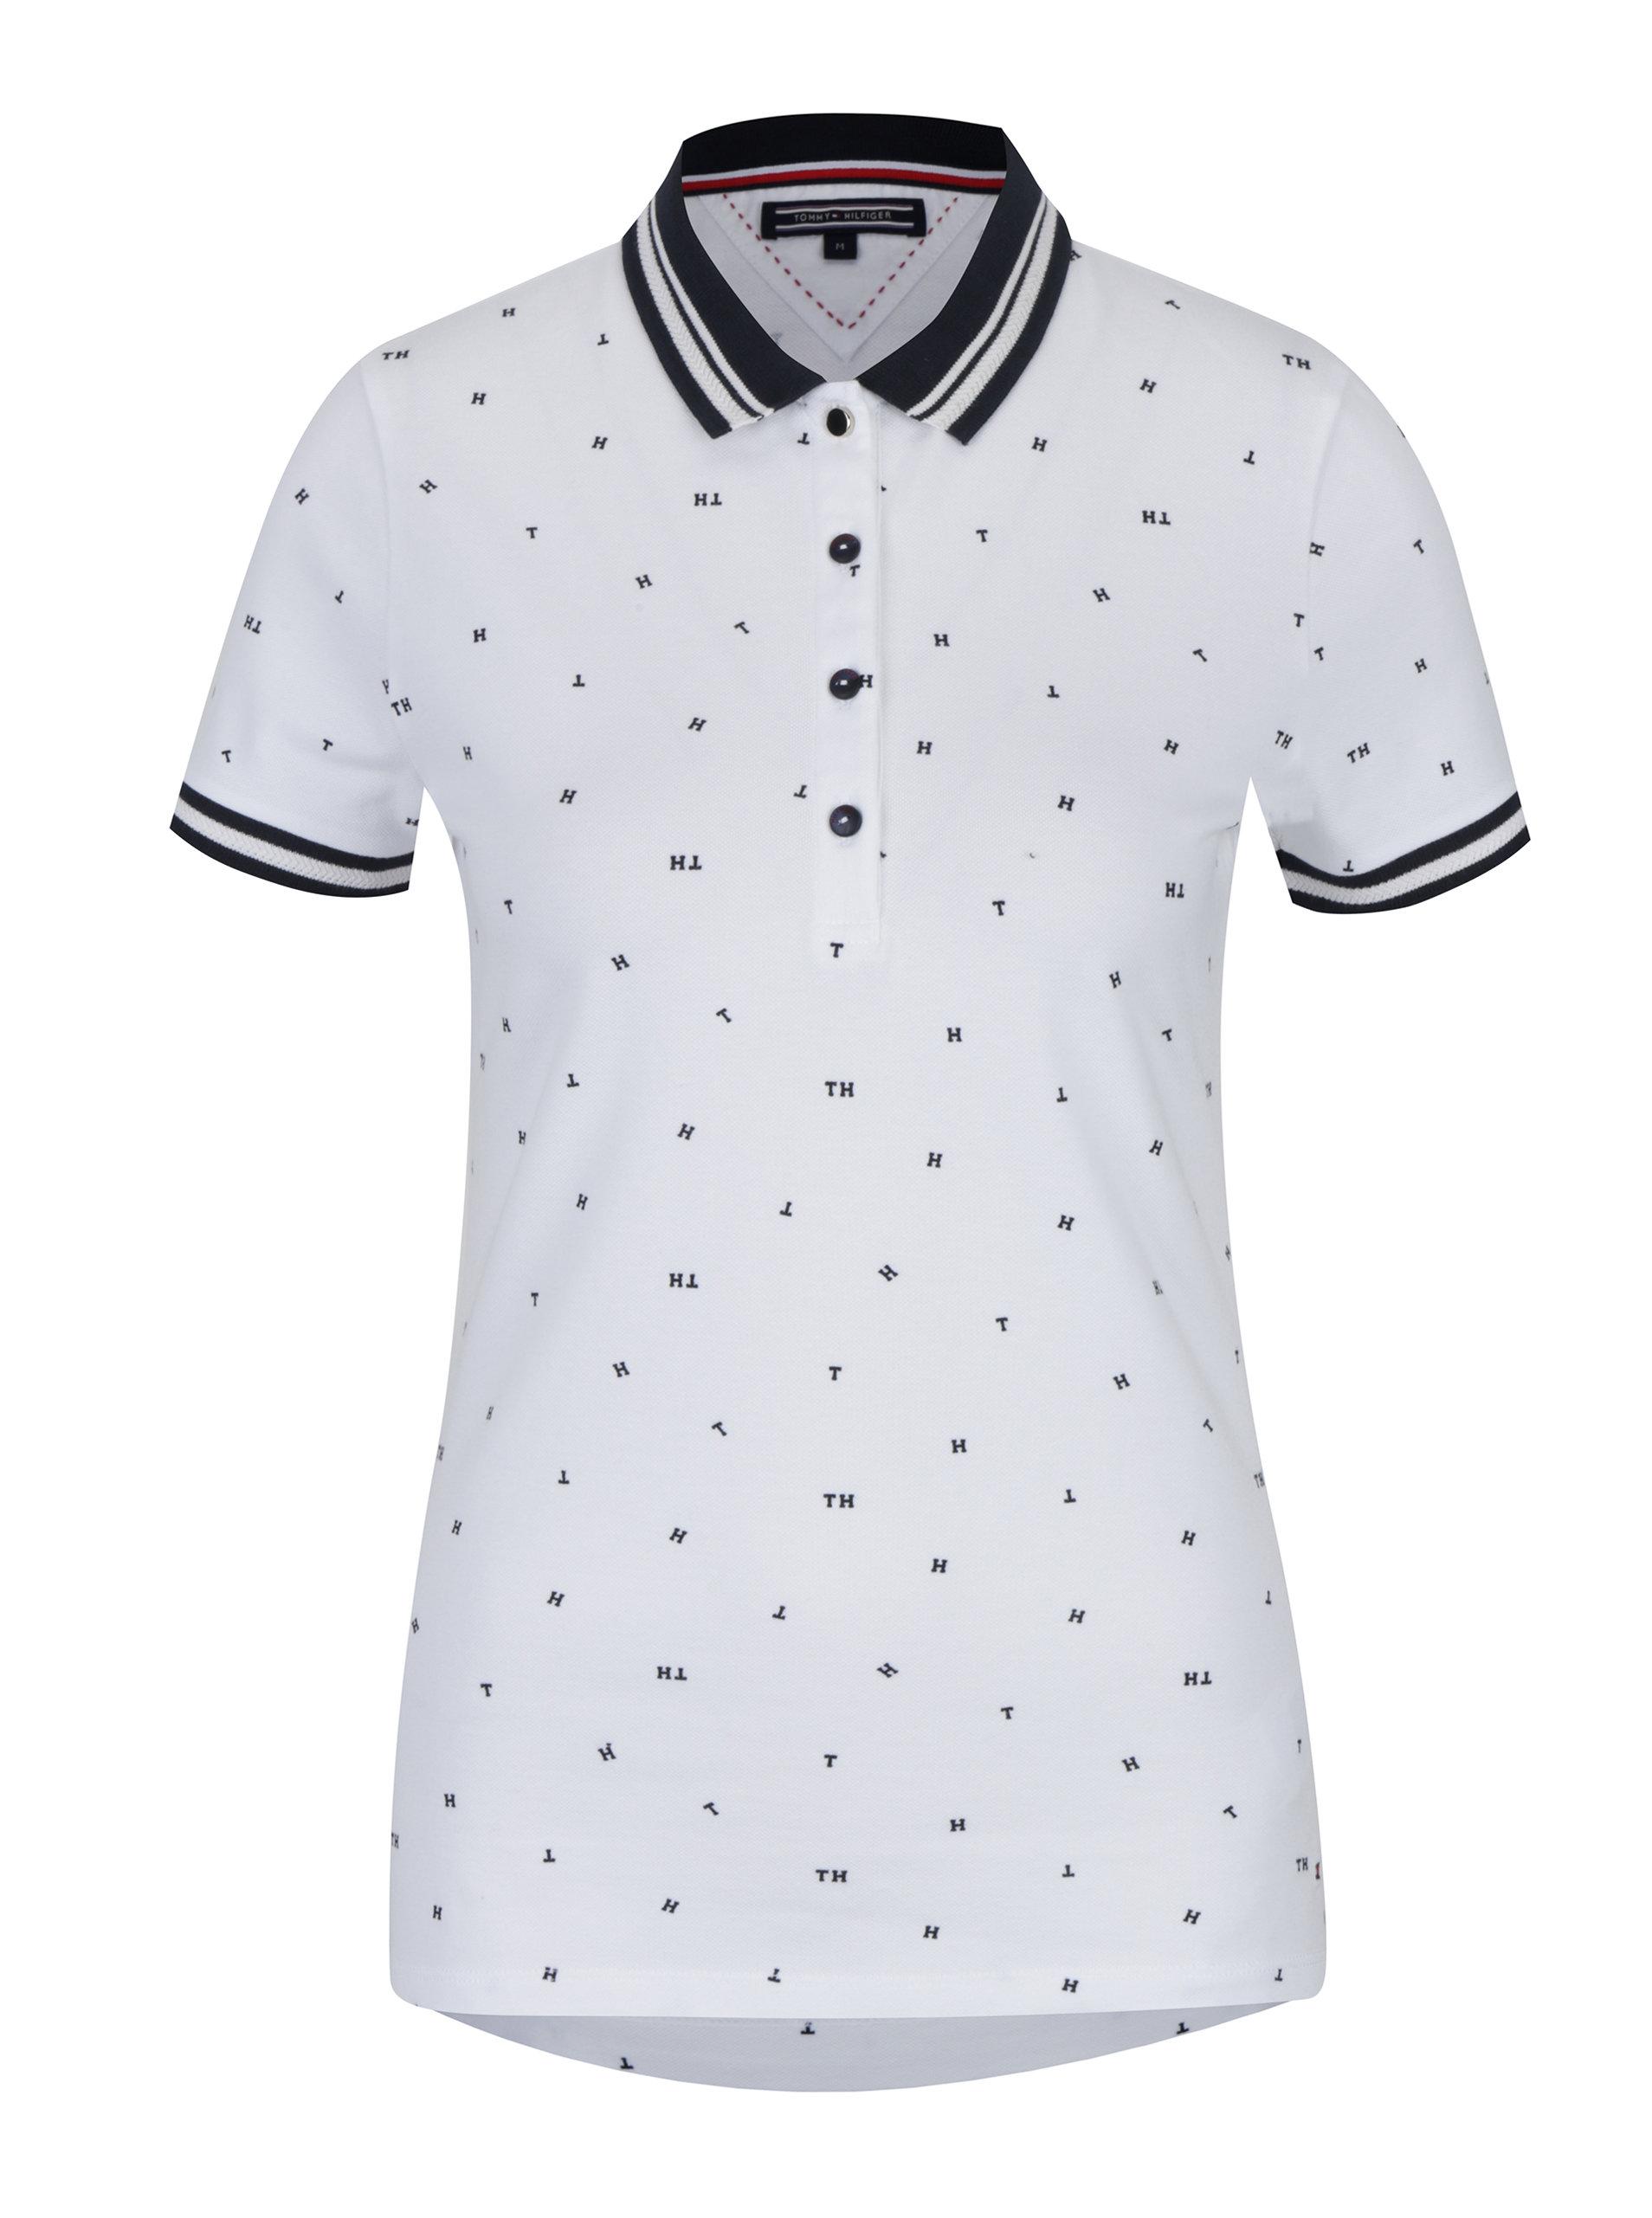 Bílé dámské vzorované polo tričko Tommy Hilfiger Talisha ... 54eaeb00ebd